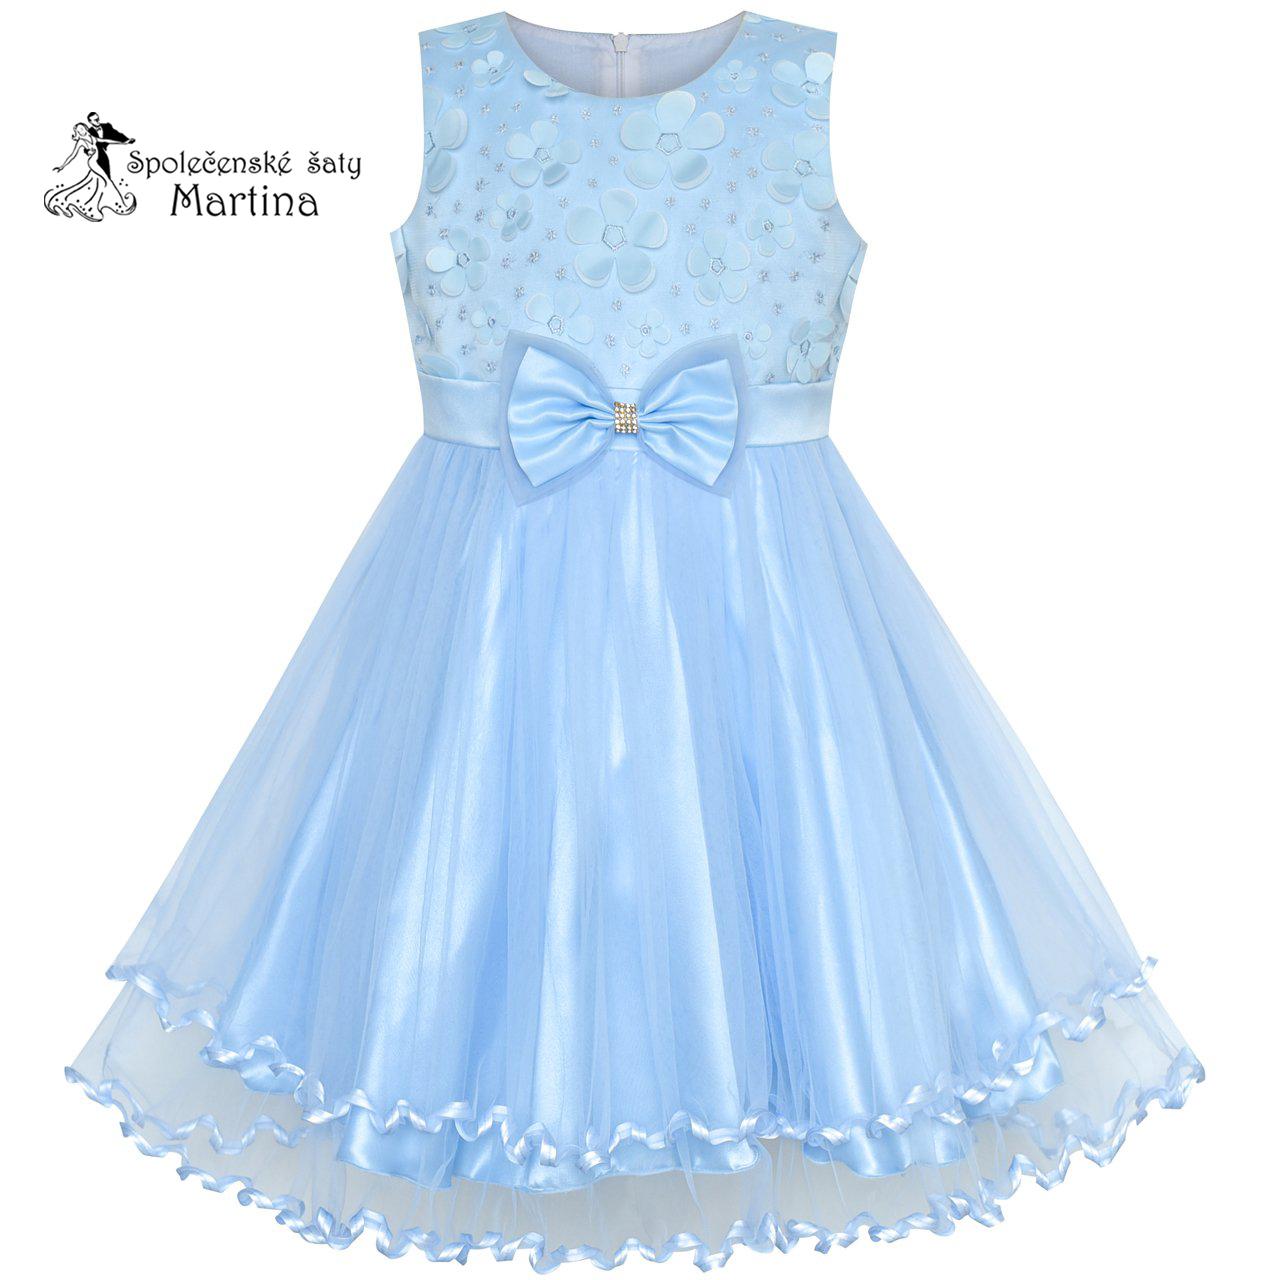 ffc253596 Dívčí šaty